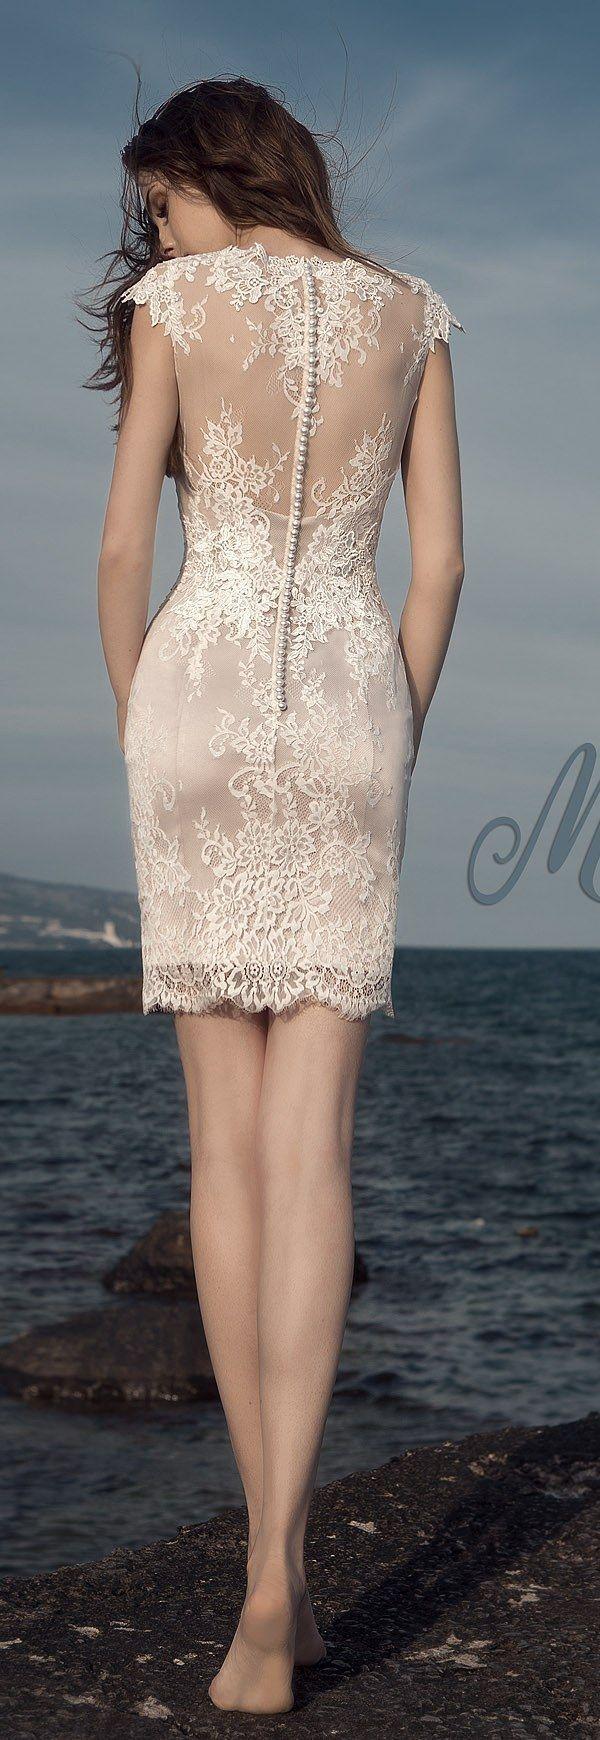 Milva Bridal Wedding Dresses 2017 Elba / http://www.deerpearlflowers.com/milva-wedding-dresses/10/